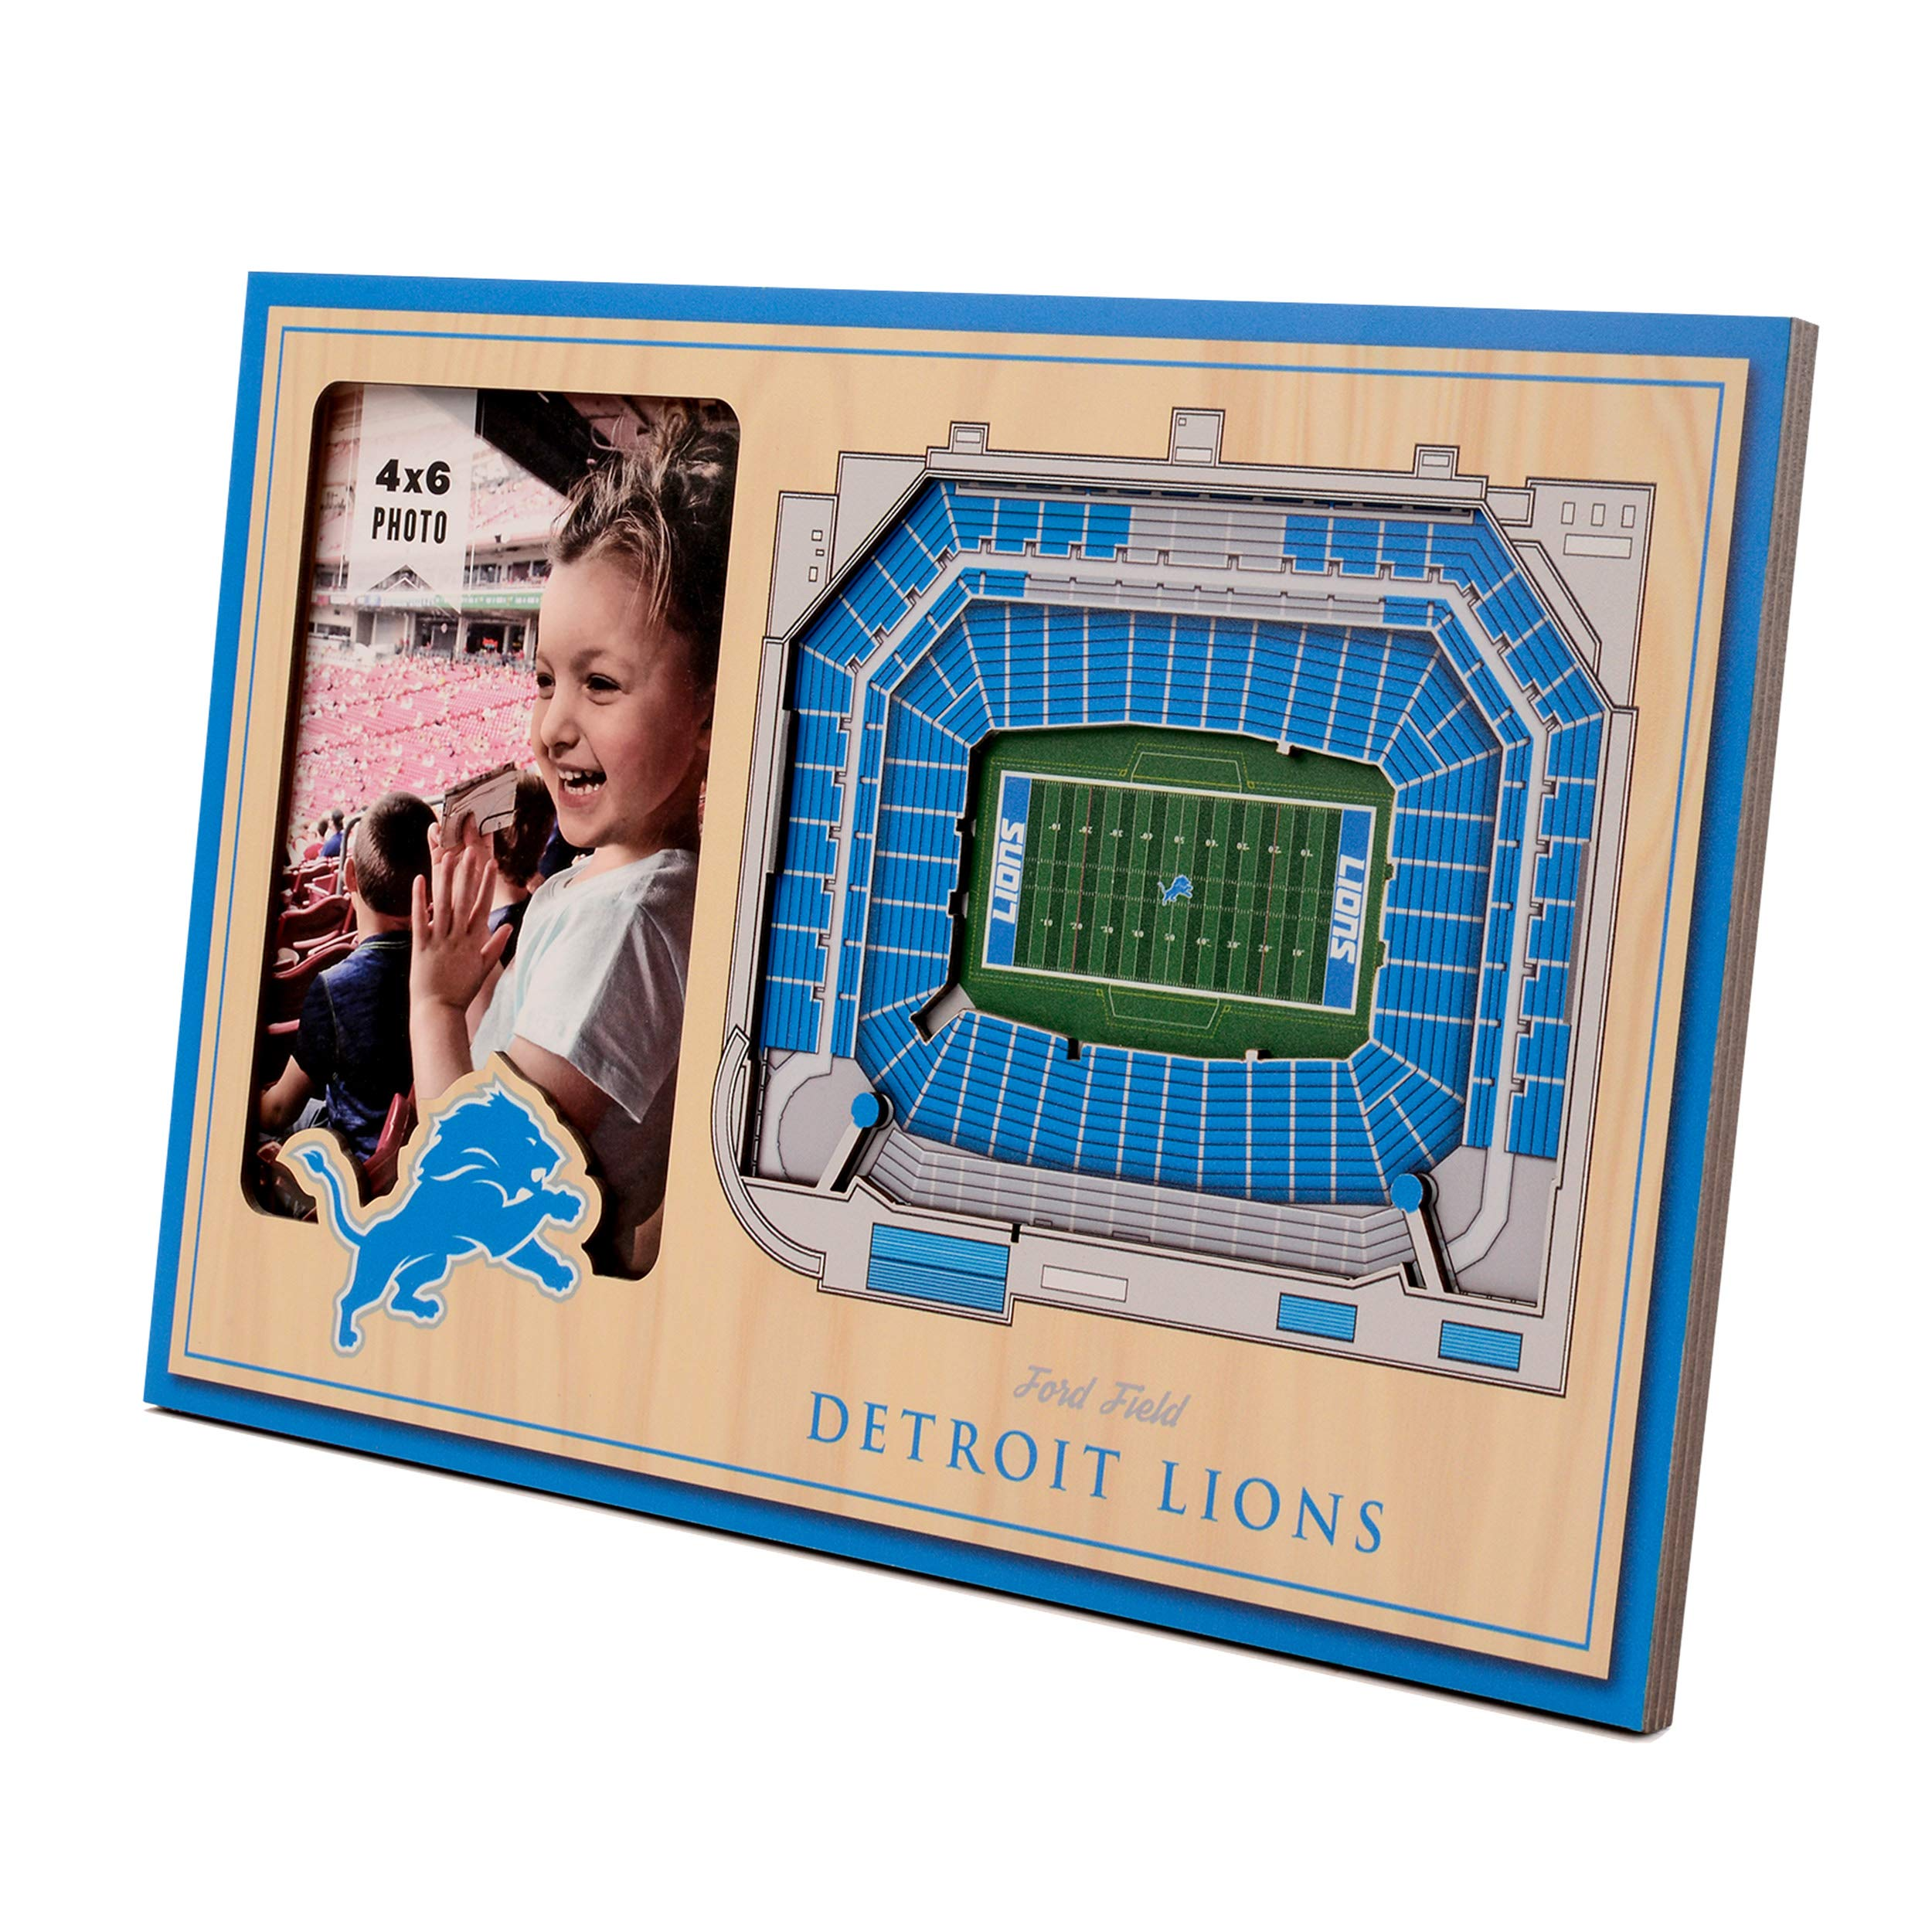 NFL Detroit Lions 3D StadiumViews Picture Frame by YouTheFan